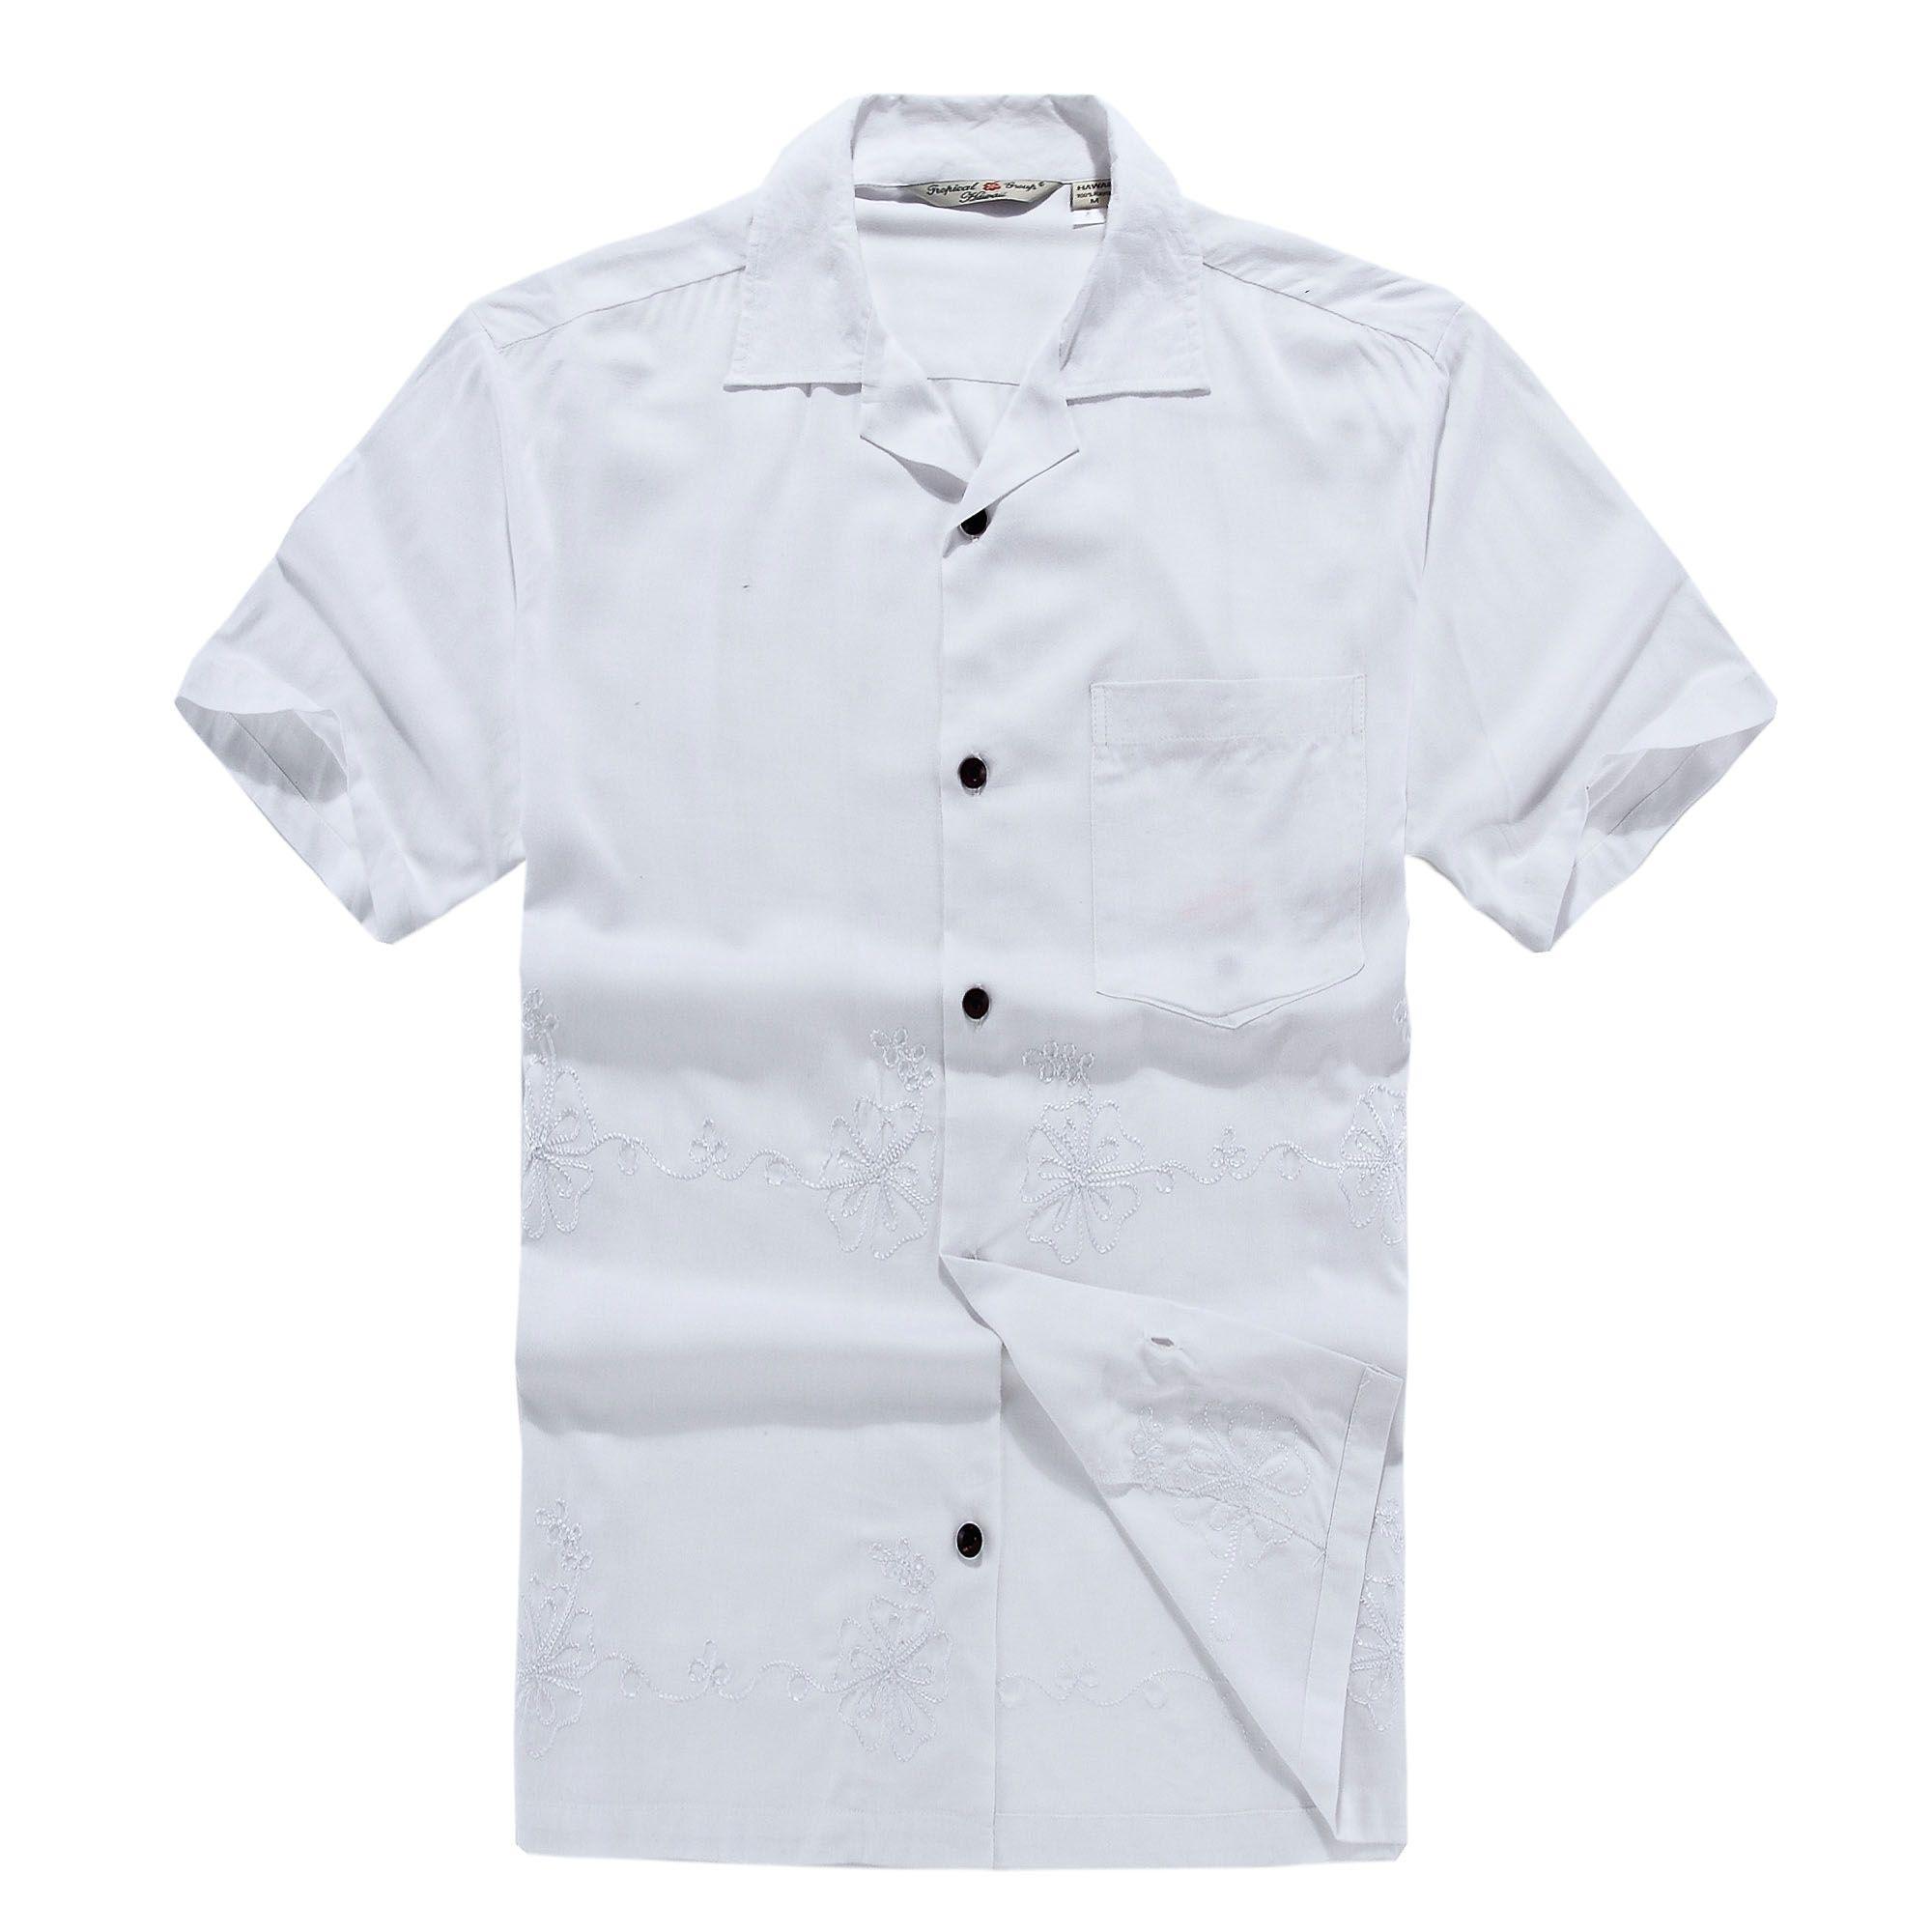 Wedding dress shirts for men  Men Hawaiian Aloha Shirt in Wedding White  Products  Pinterest